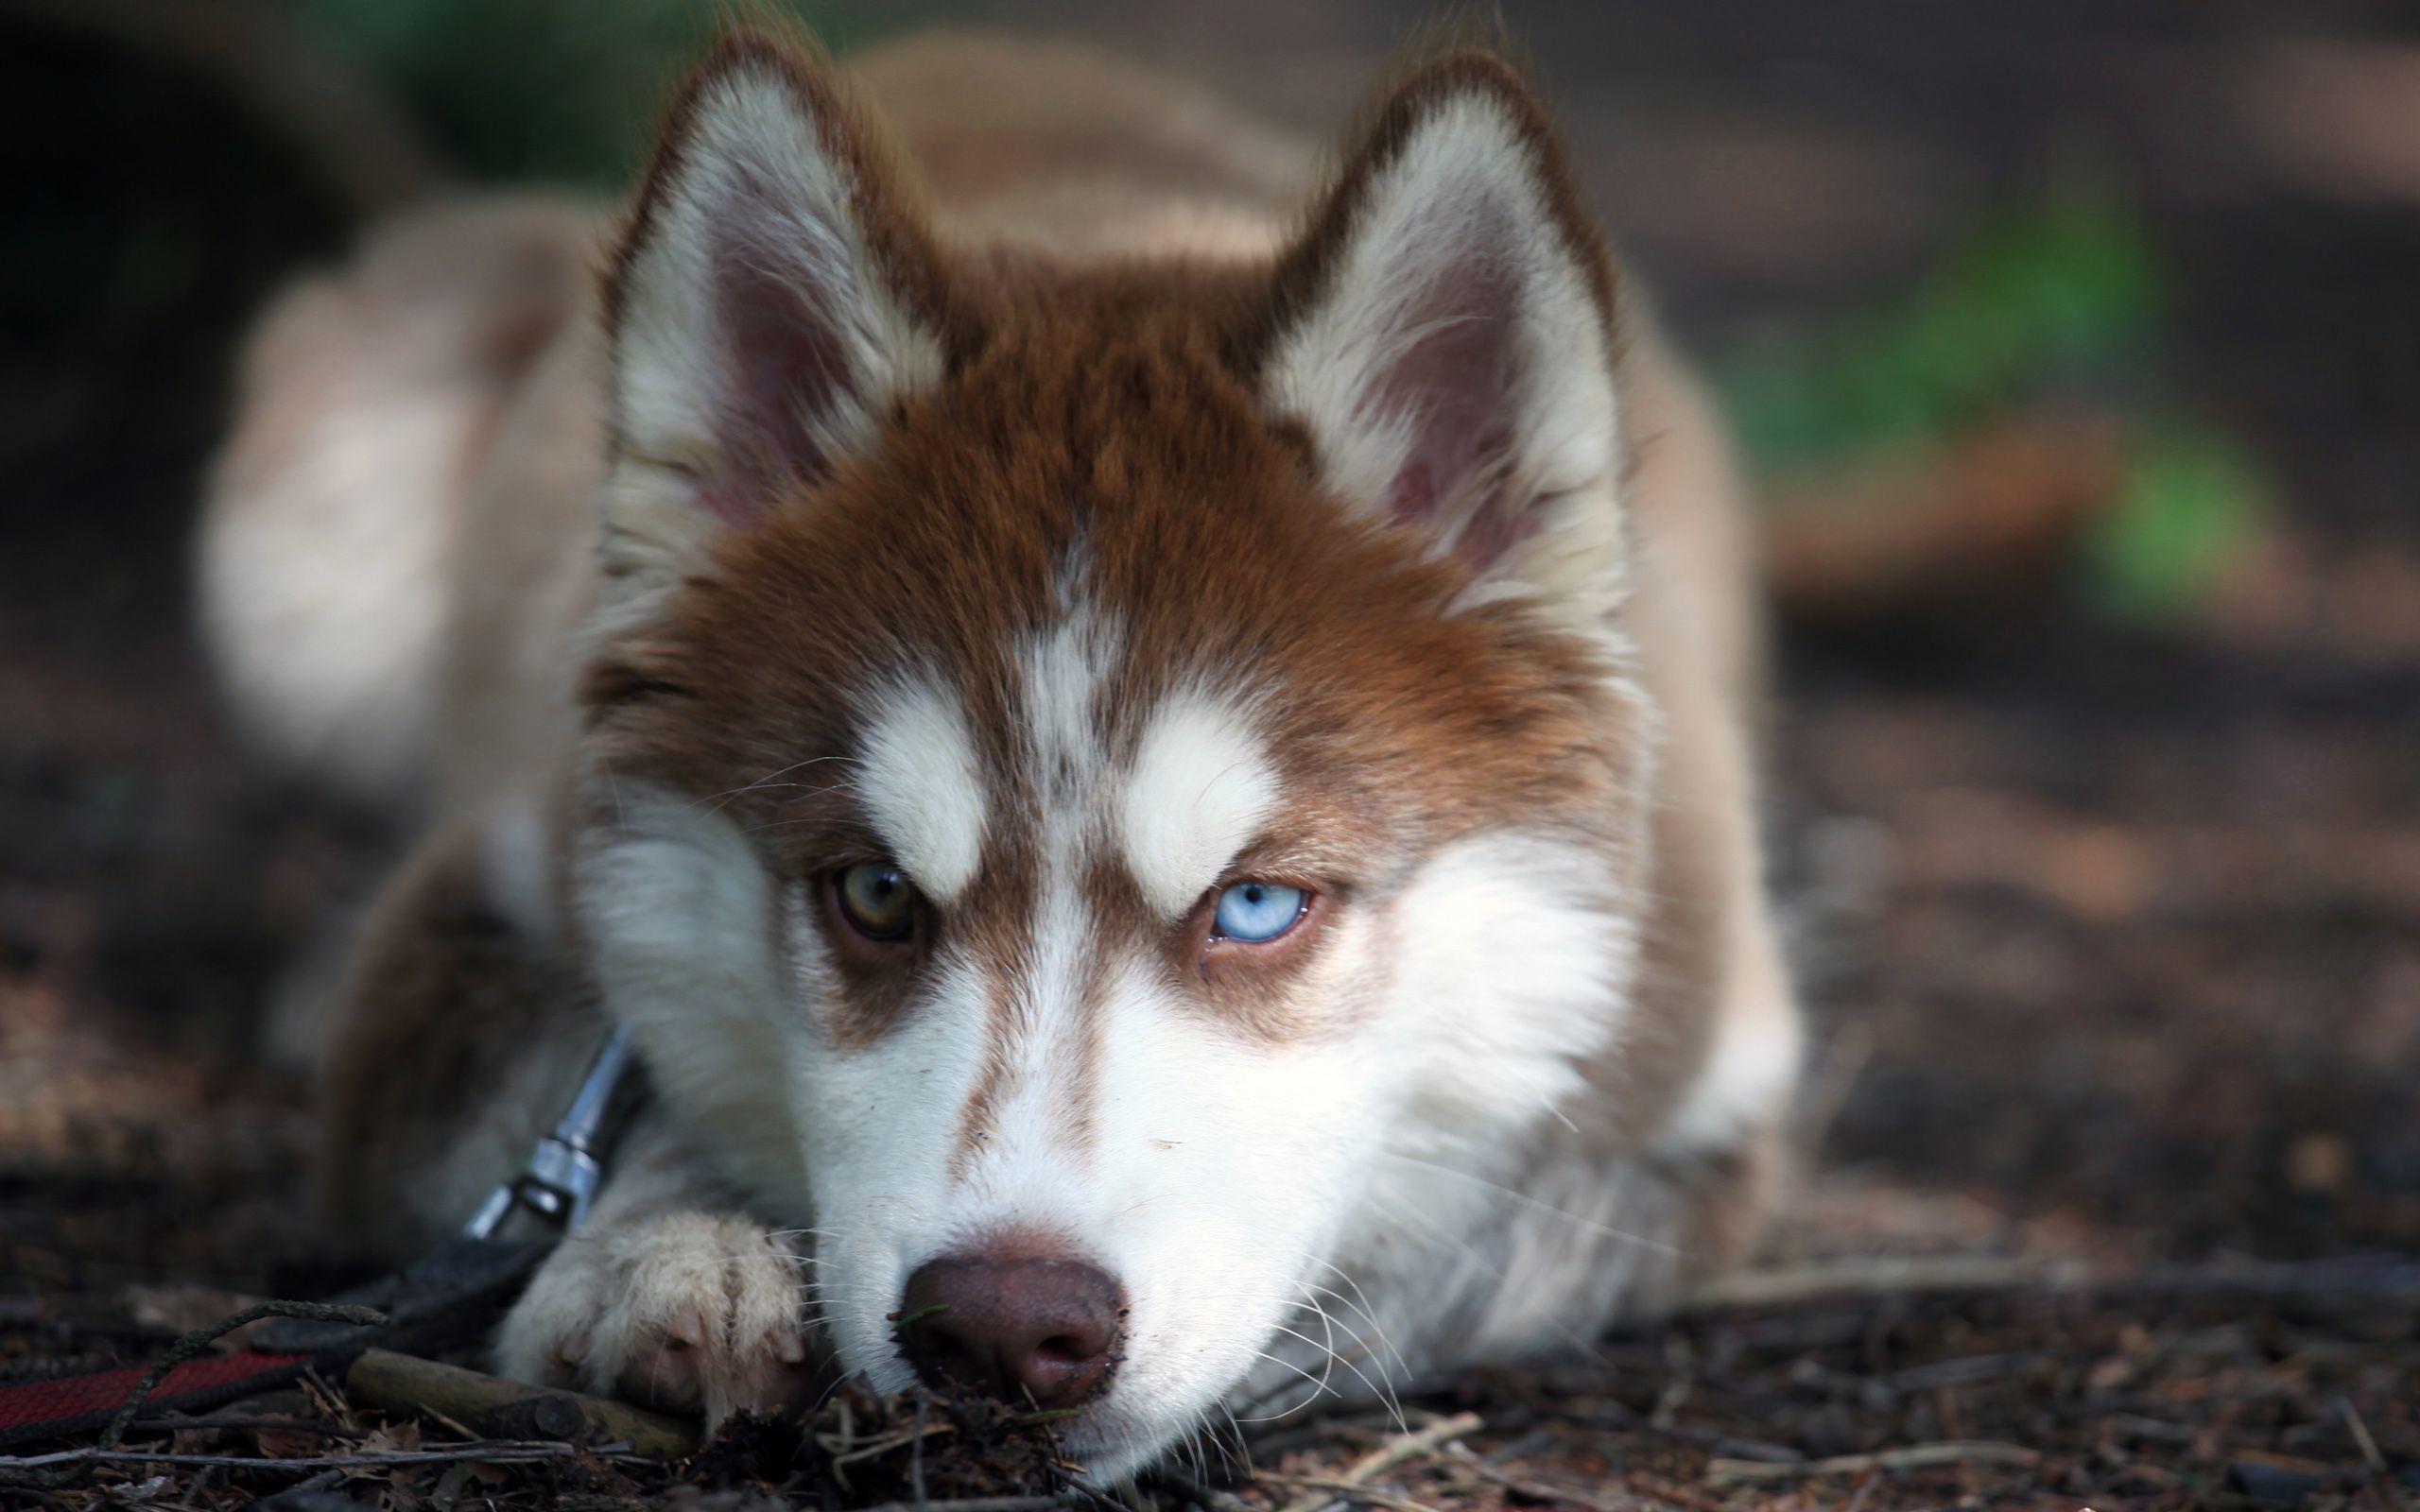 Husky Puppy Wallpapers Full Hd For Desktop Wallpaper 2560 x 1600 px 1.2 MB pitbull  cute